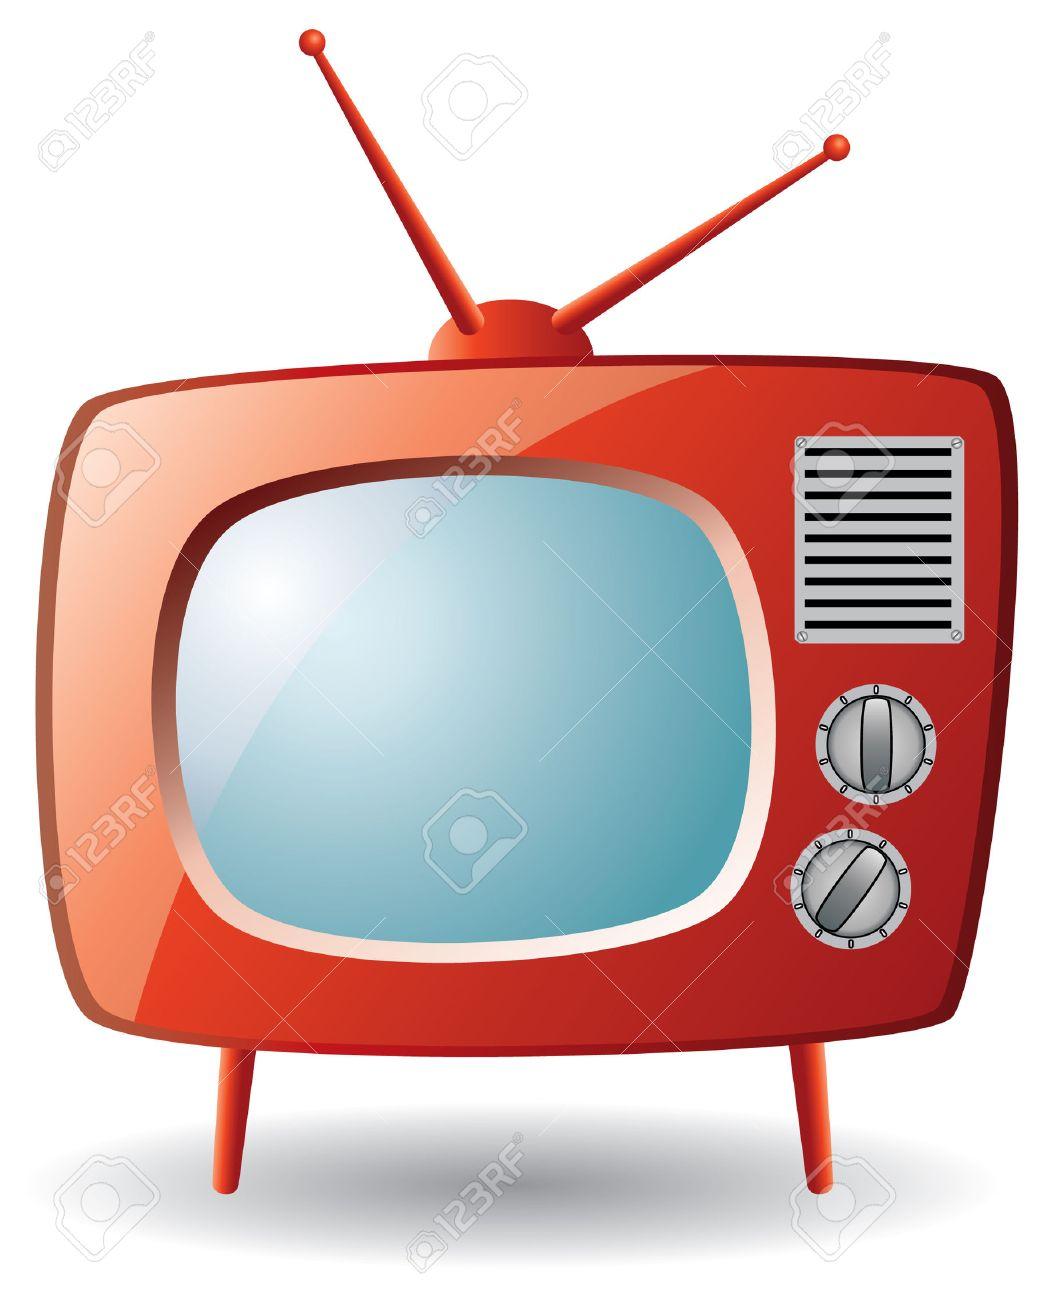 red retro tv set - 6599609